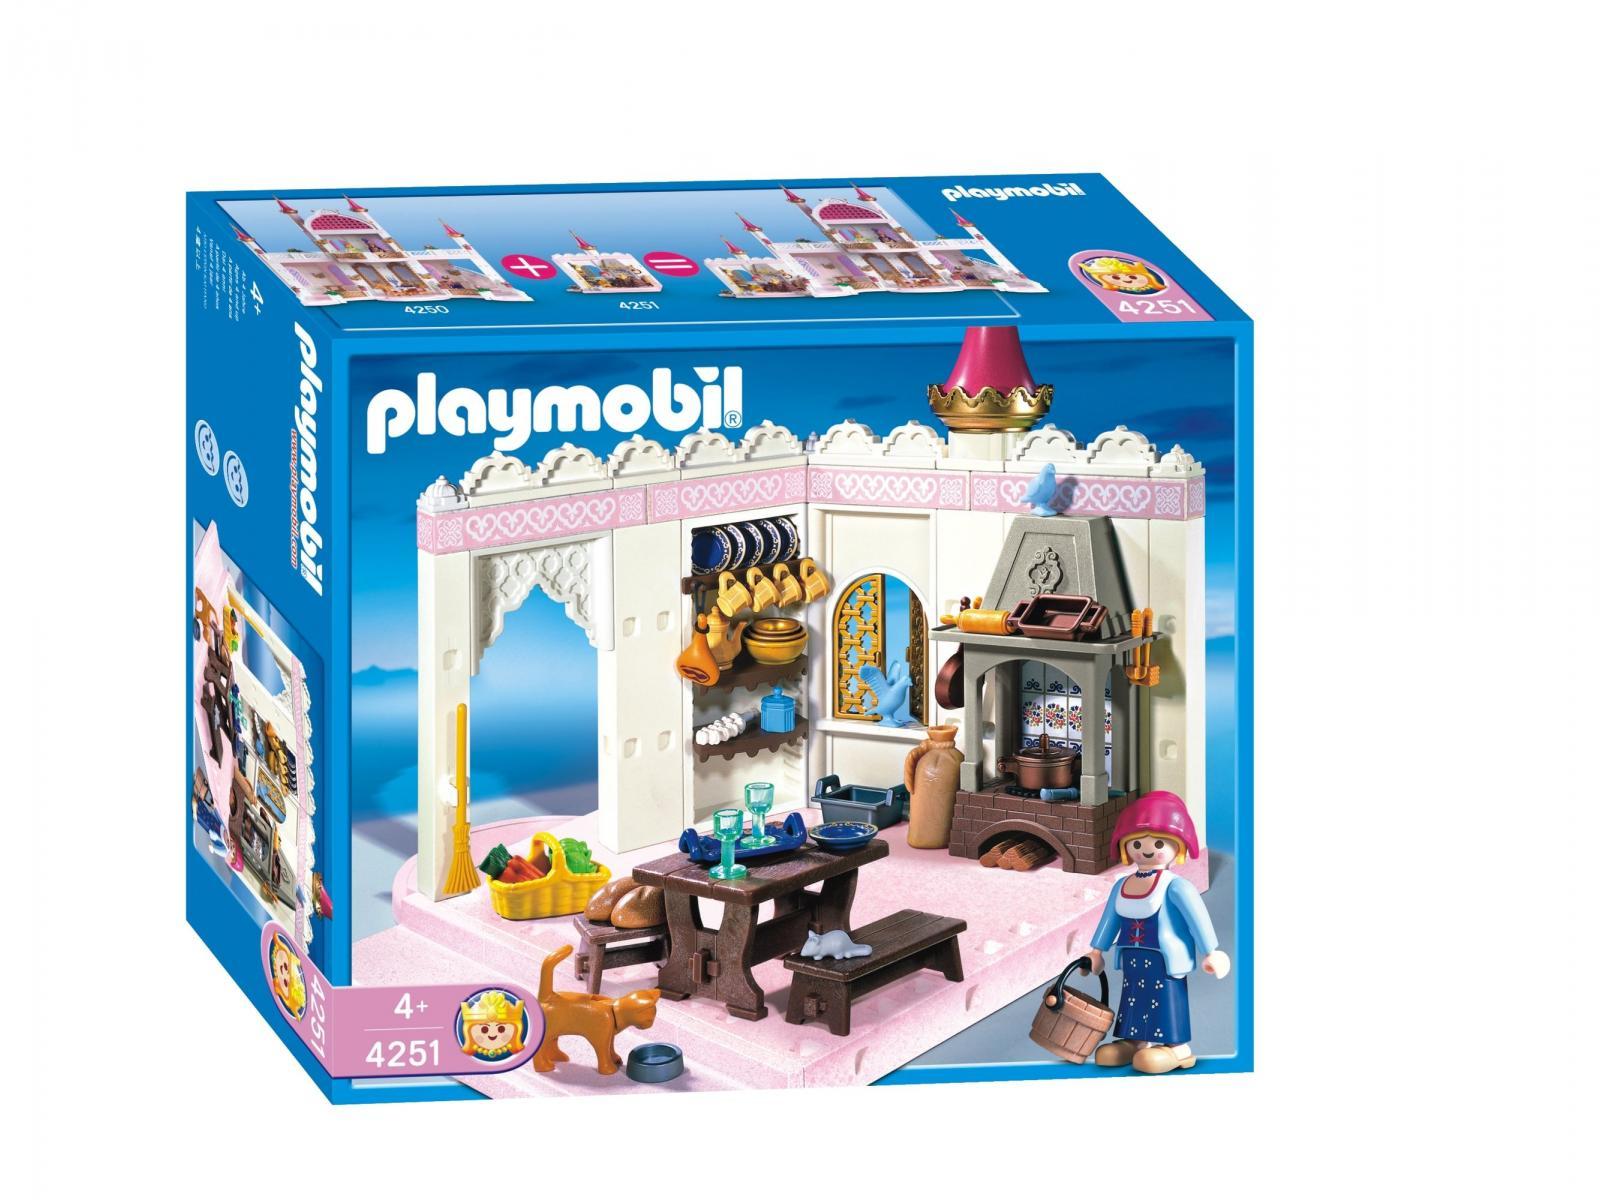 Playmobil cuisine princesse